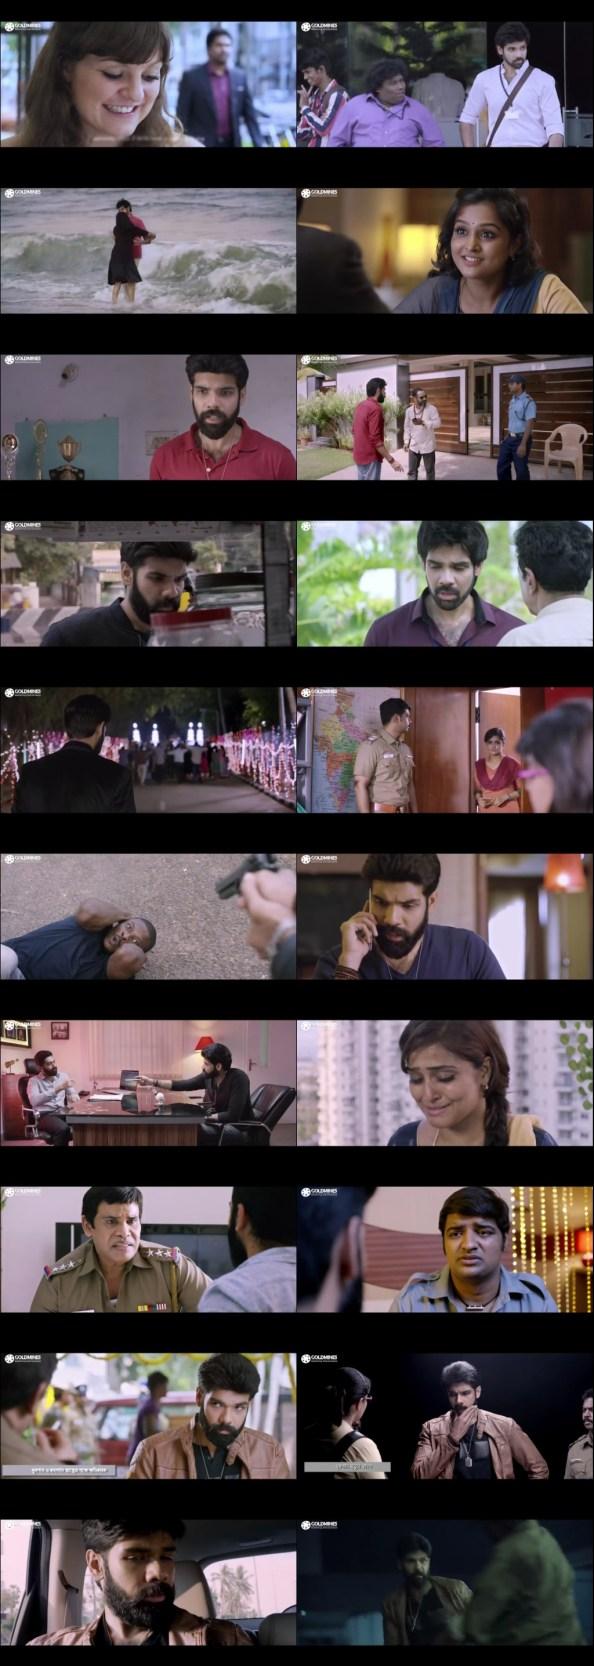 Sathya-2021-Bengali-Dubbed-Full-Movie-Sibi-Sathyaraj-Ramya-Nambeesan-YT-720p-Xp-X-I1-WCjfs